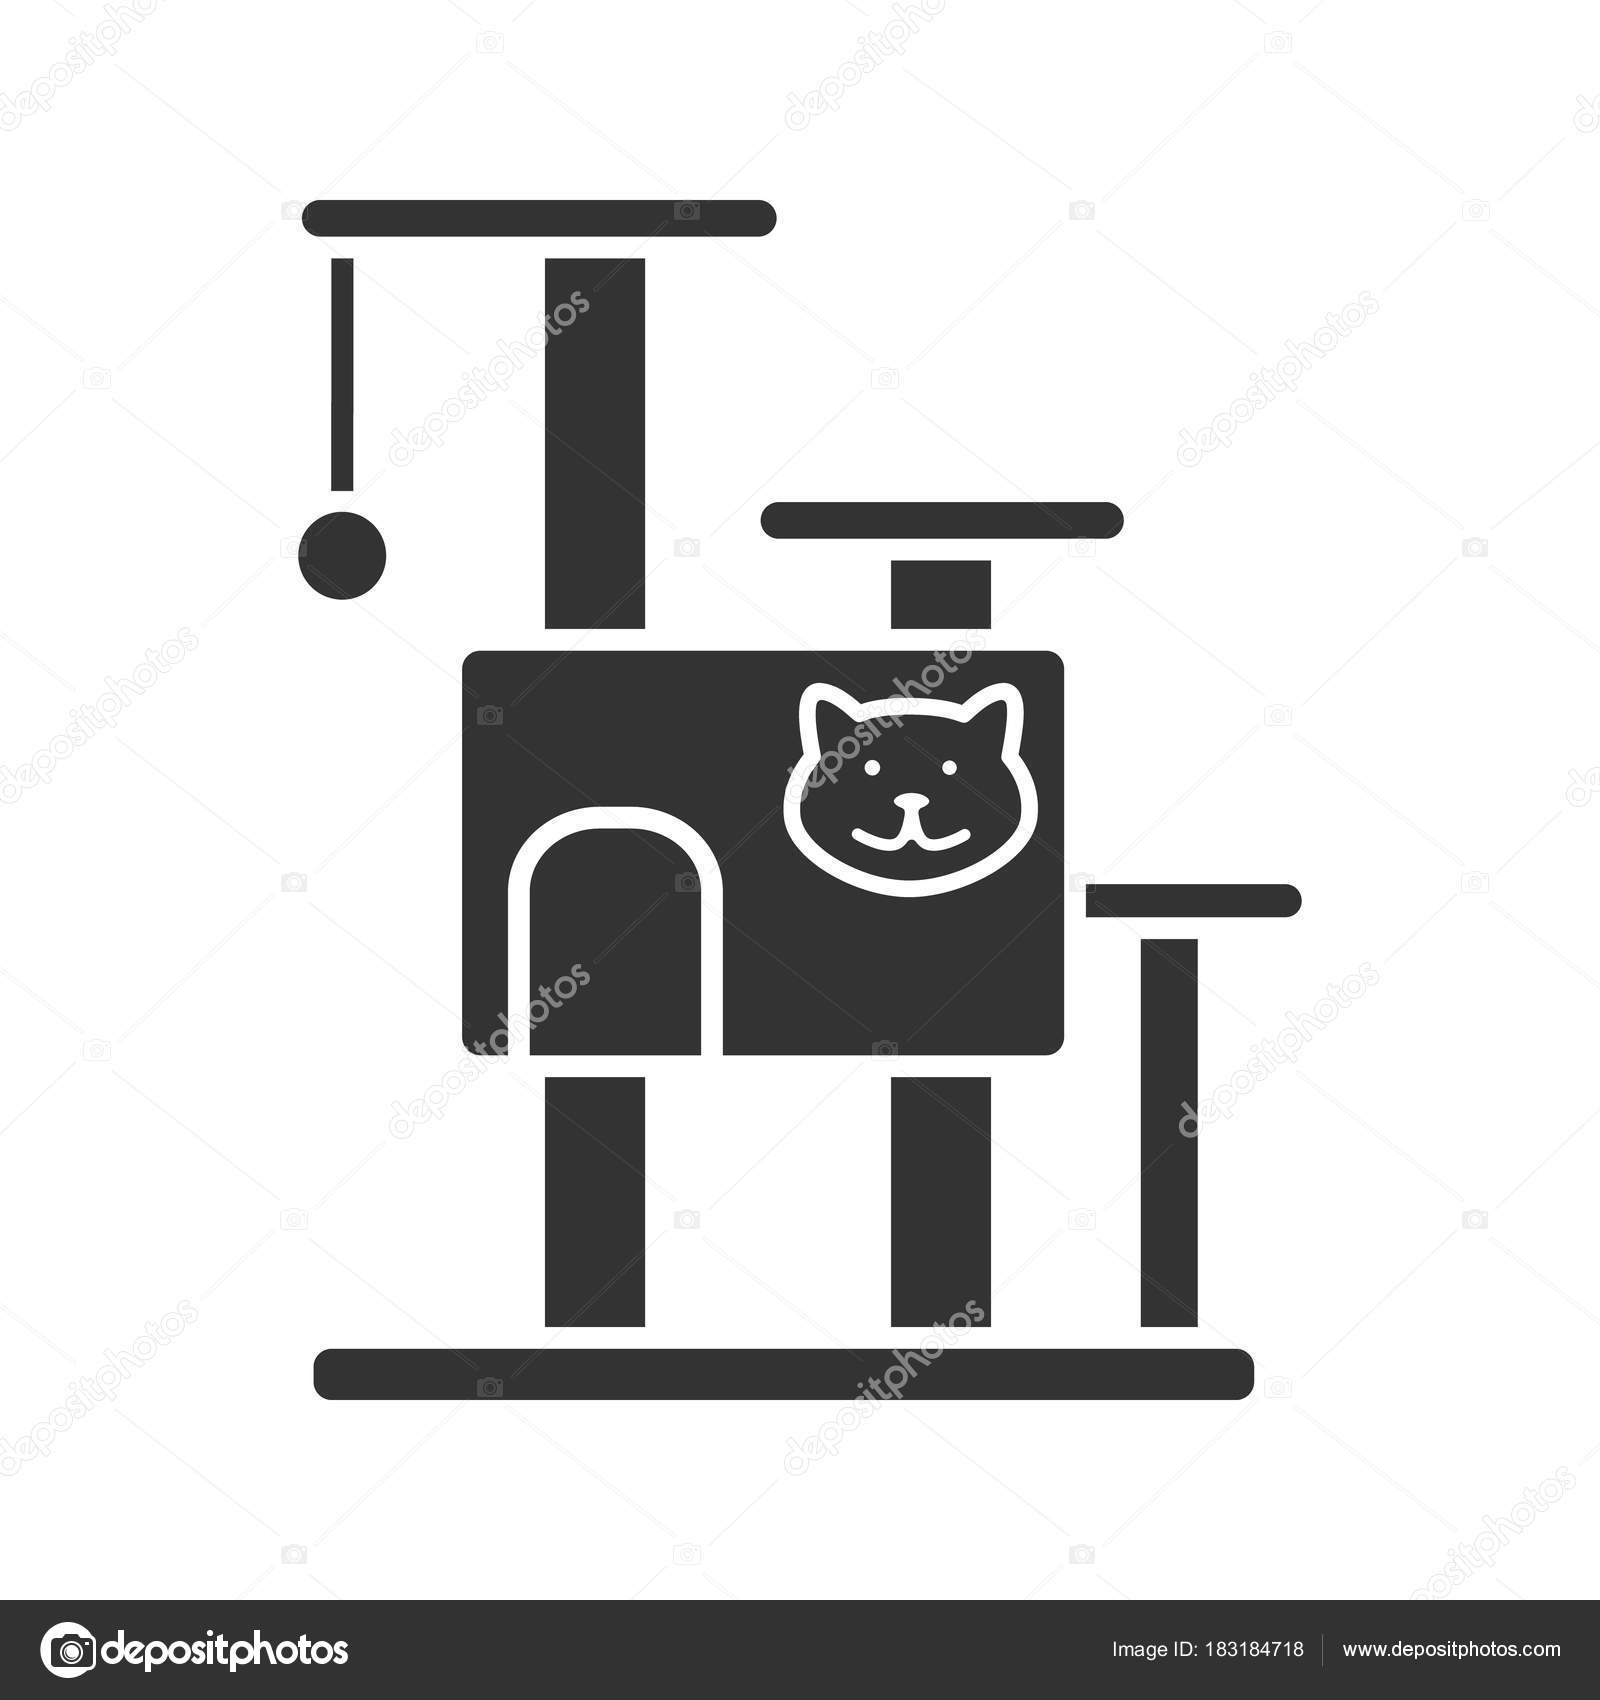 Awe Inspiring Cat Tree House Glyph Icon Pets Furniture Scratching Post Download Free Architecture Designs Scobabritishbridgeorg